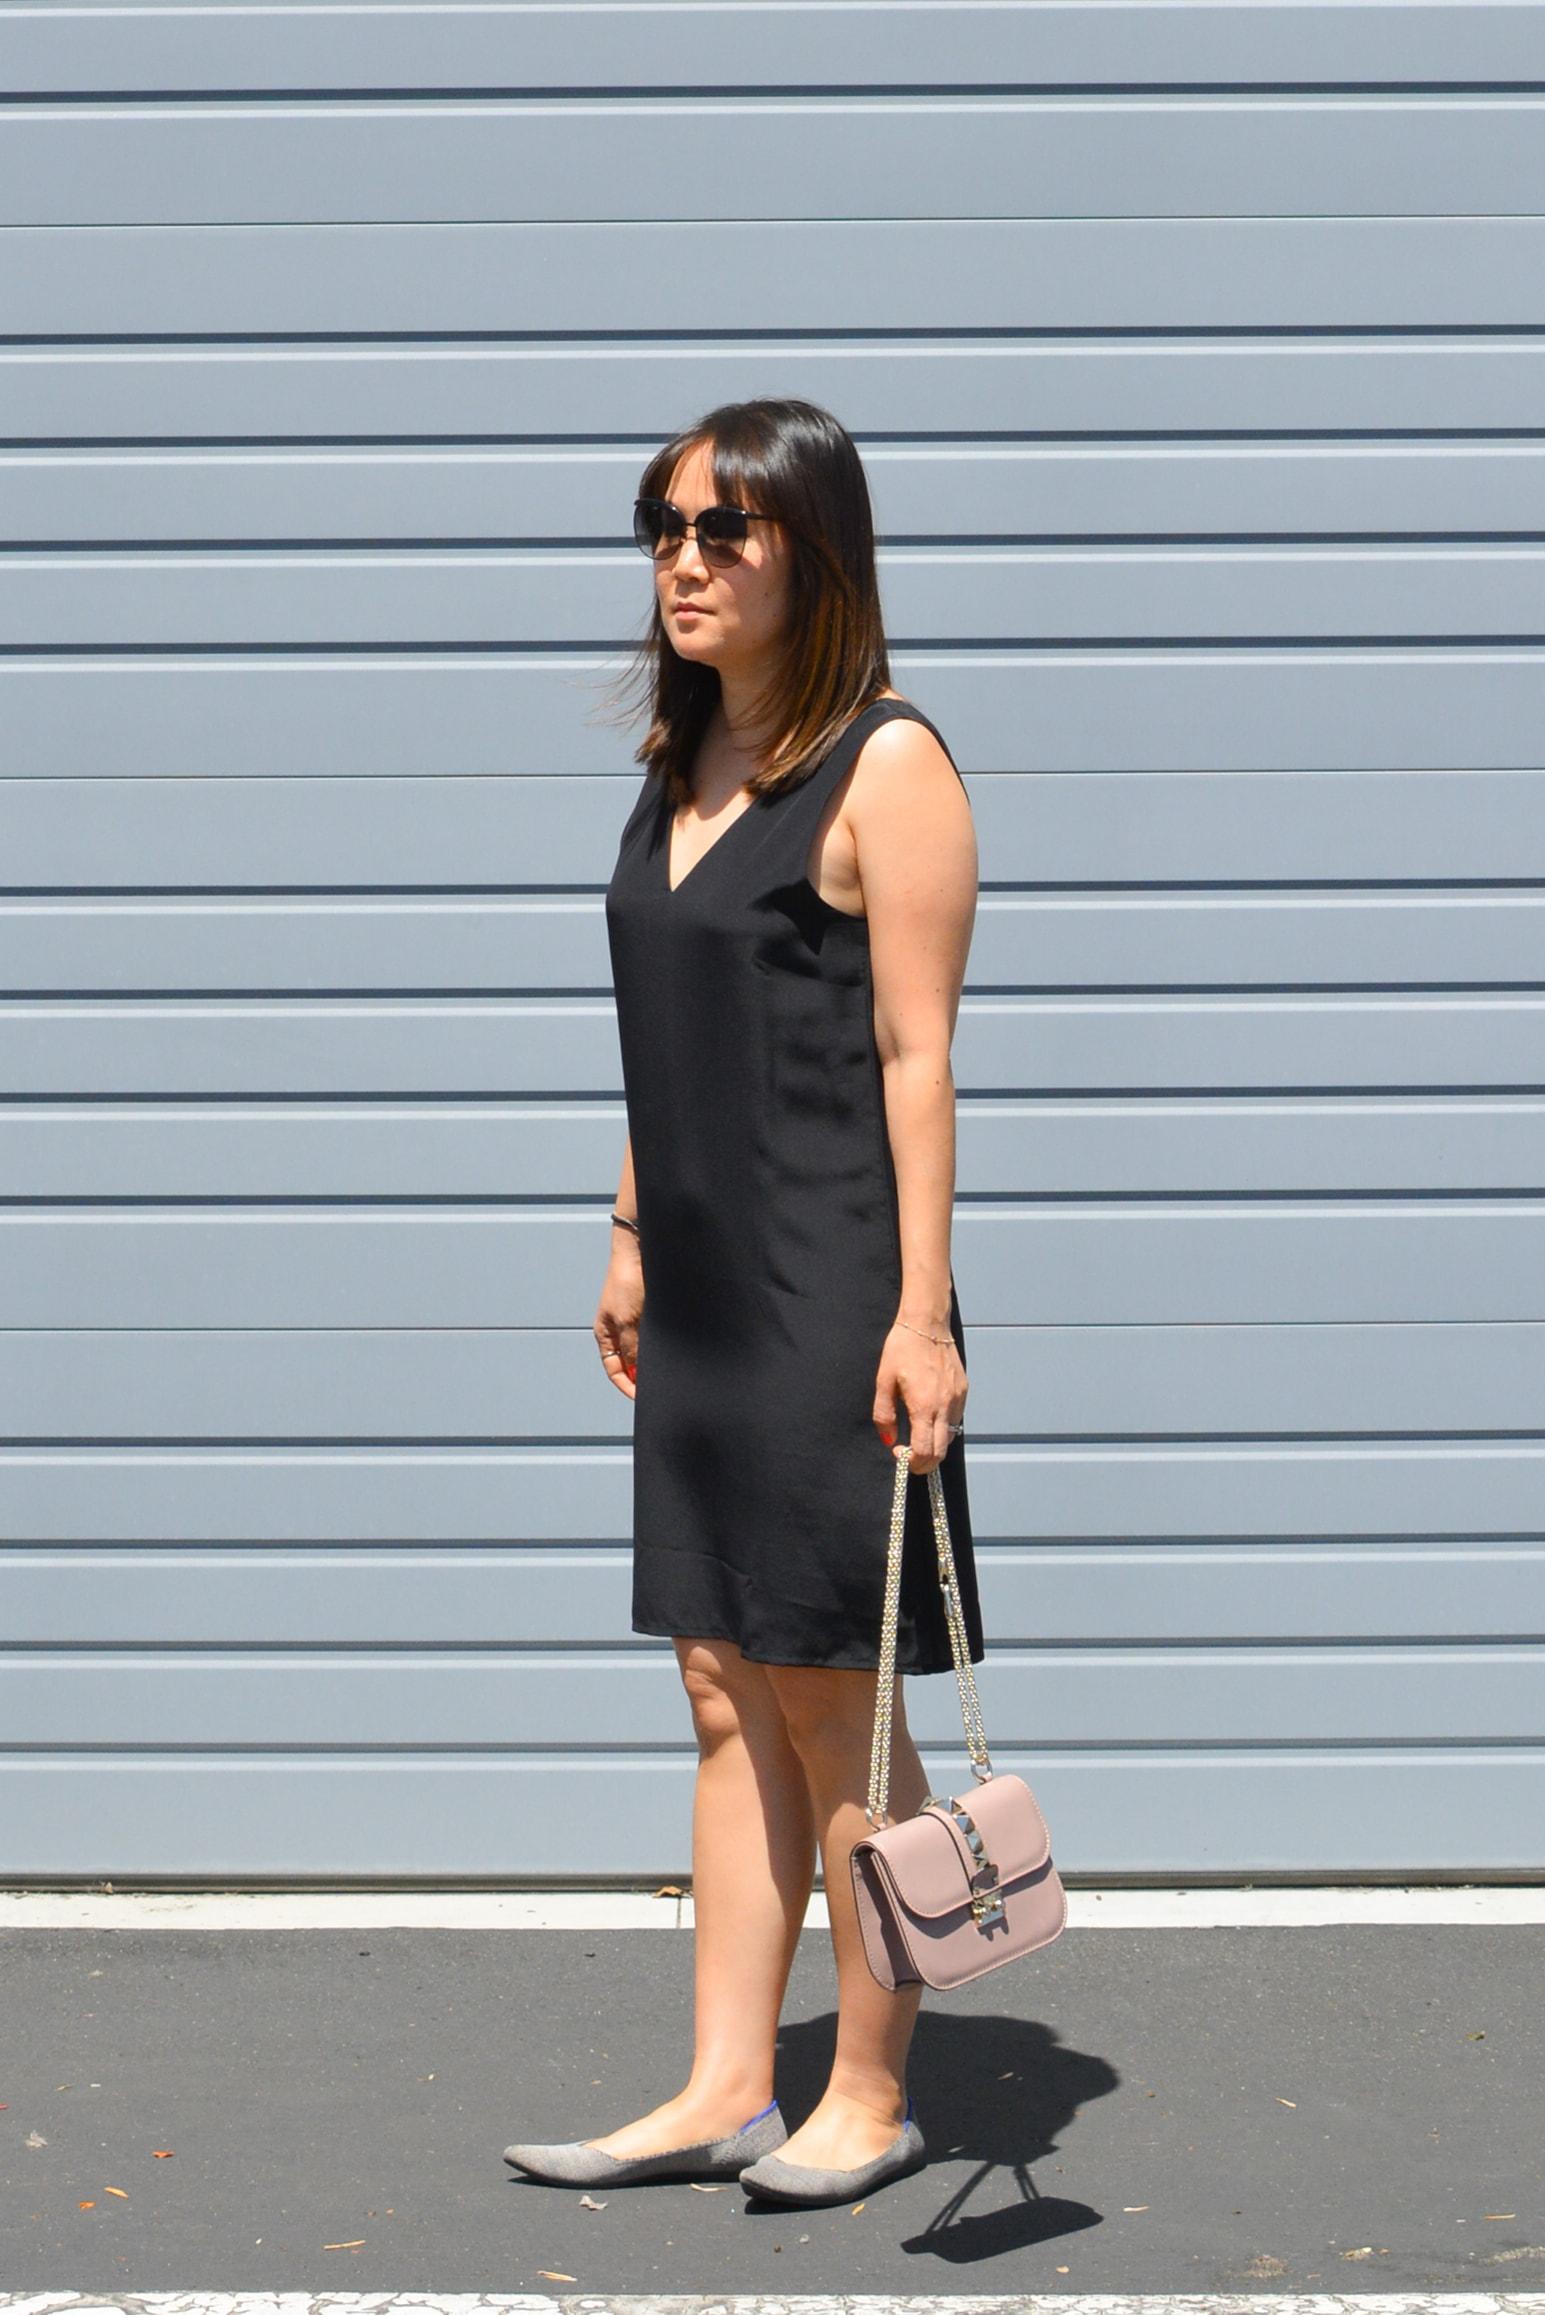 Grana Review Silk V-neck Shift Dress (2 of 2)-min.jpg